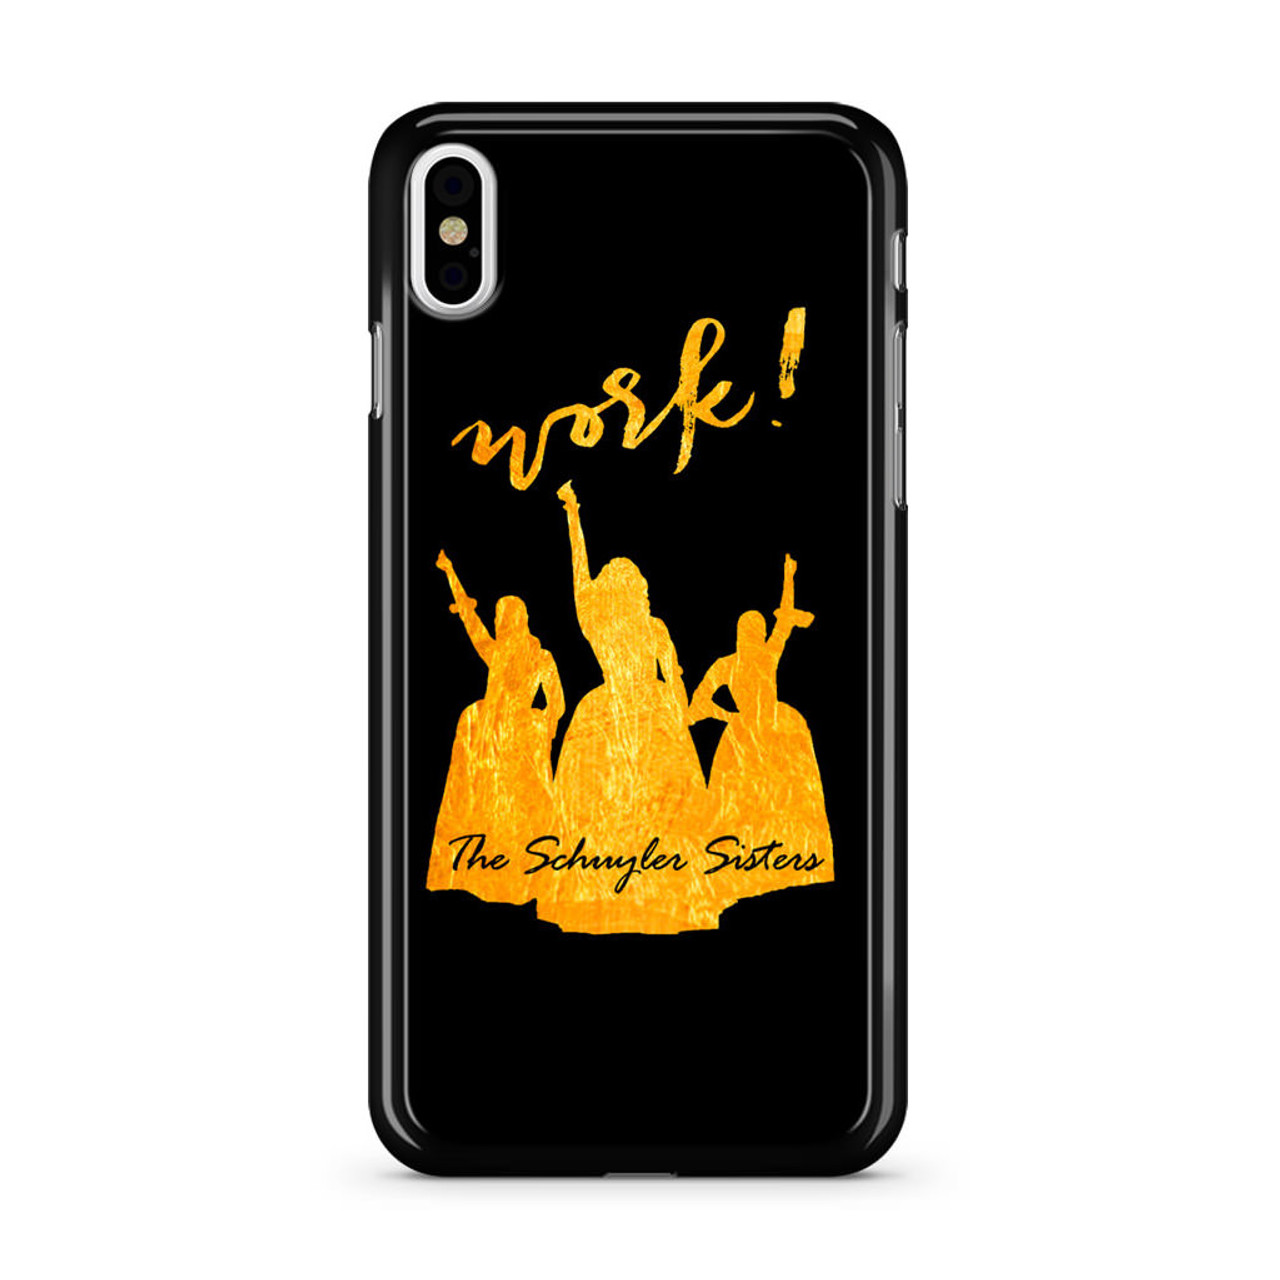 on sale 7c060 d1f58 The Schuyler Sisters Hamilton iPhone X Case